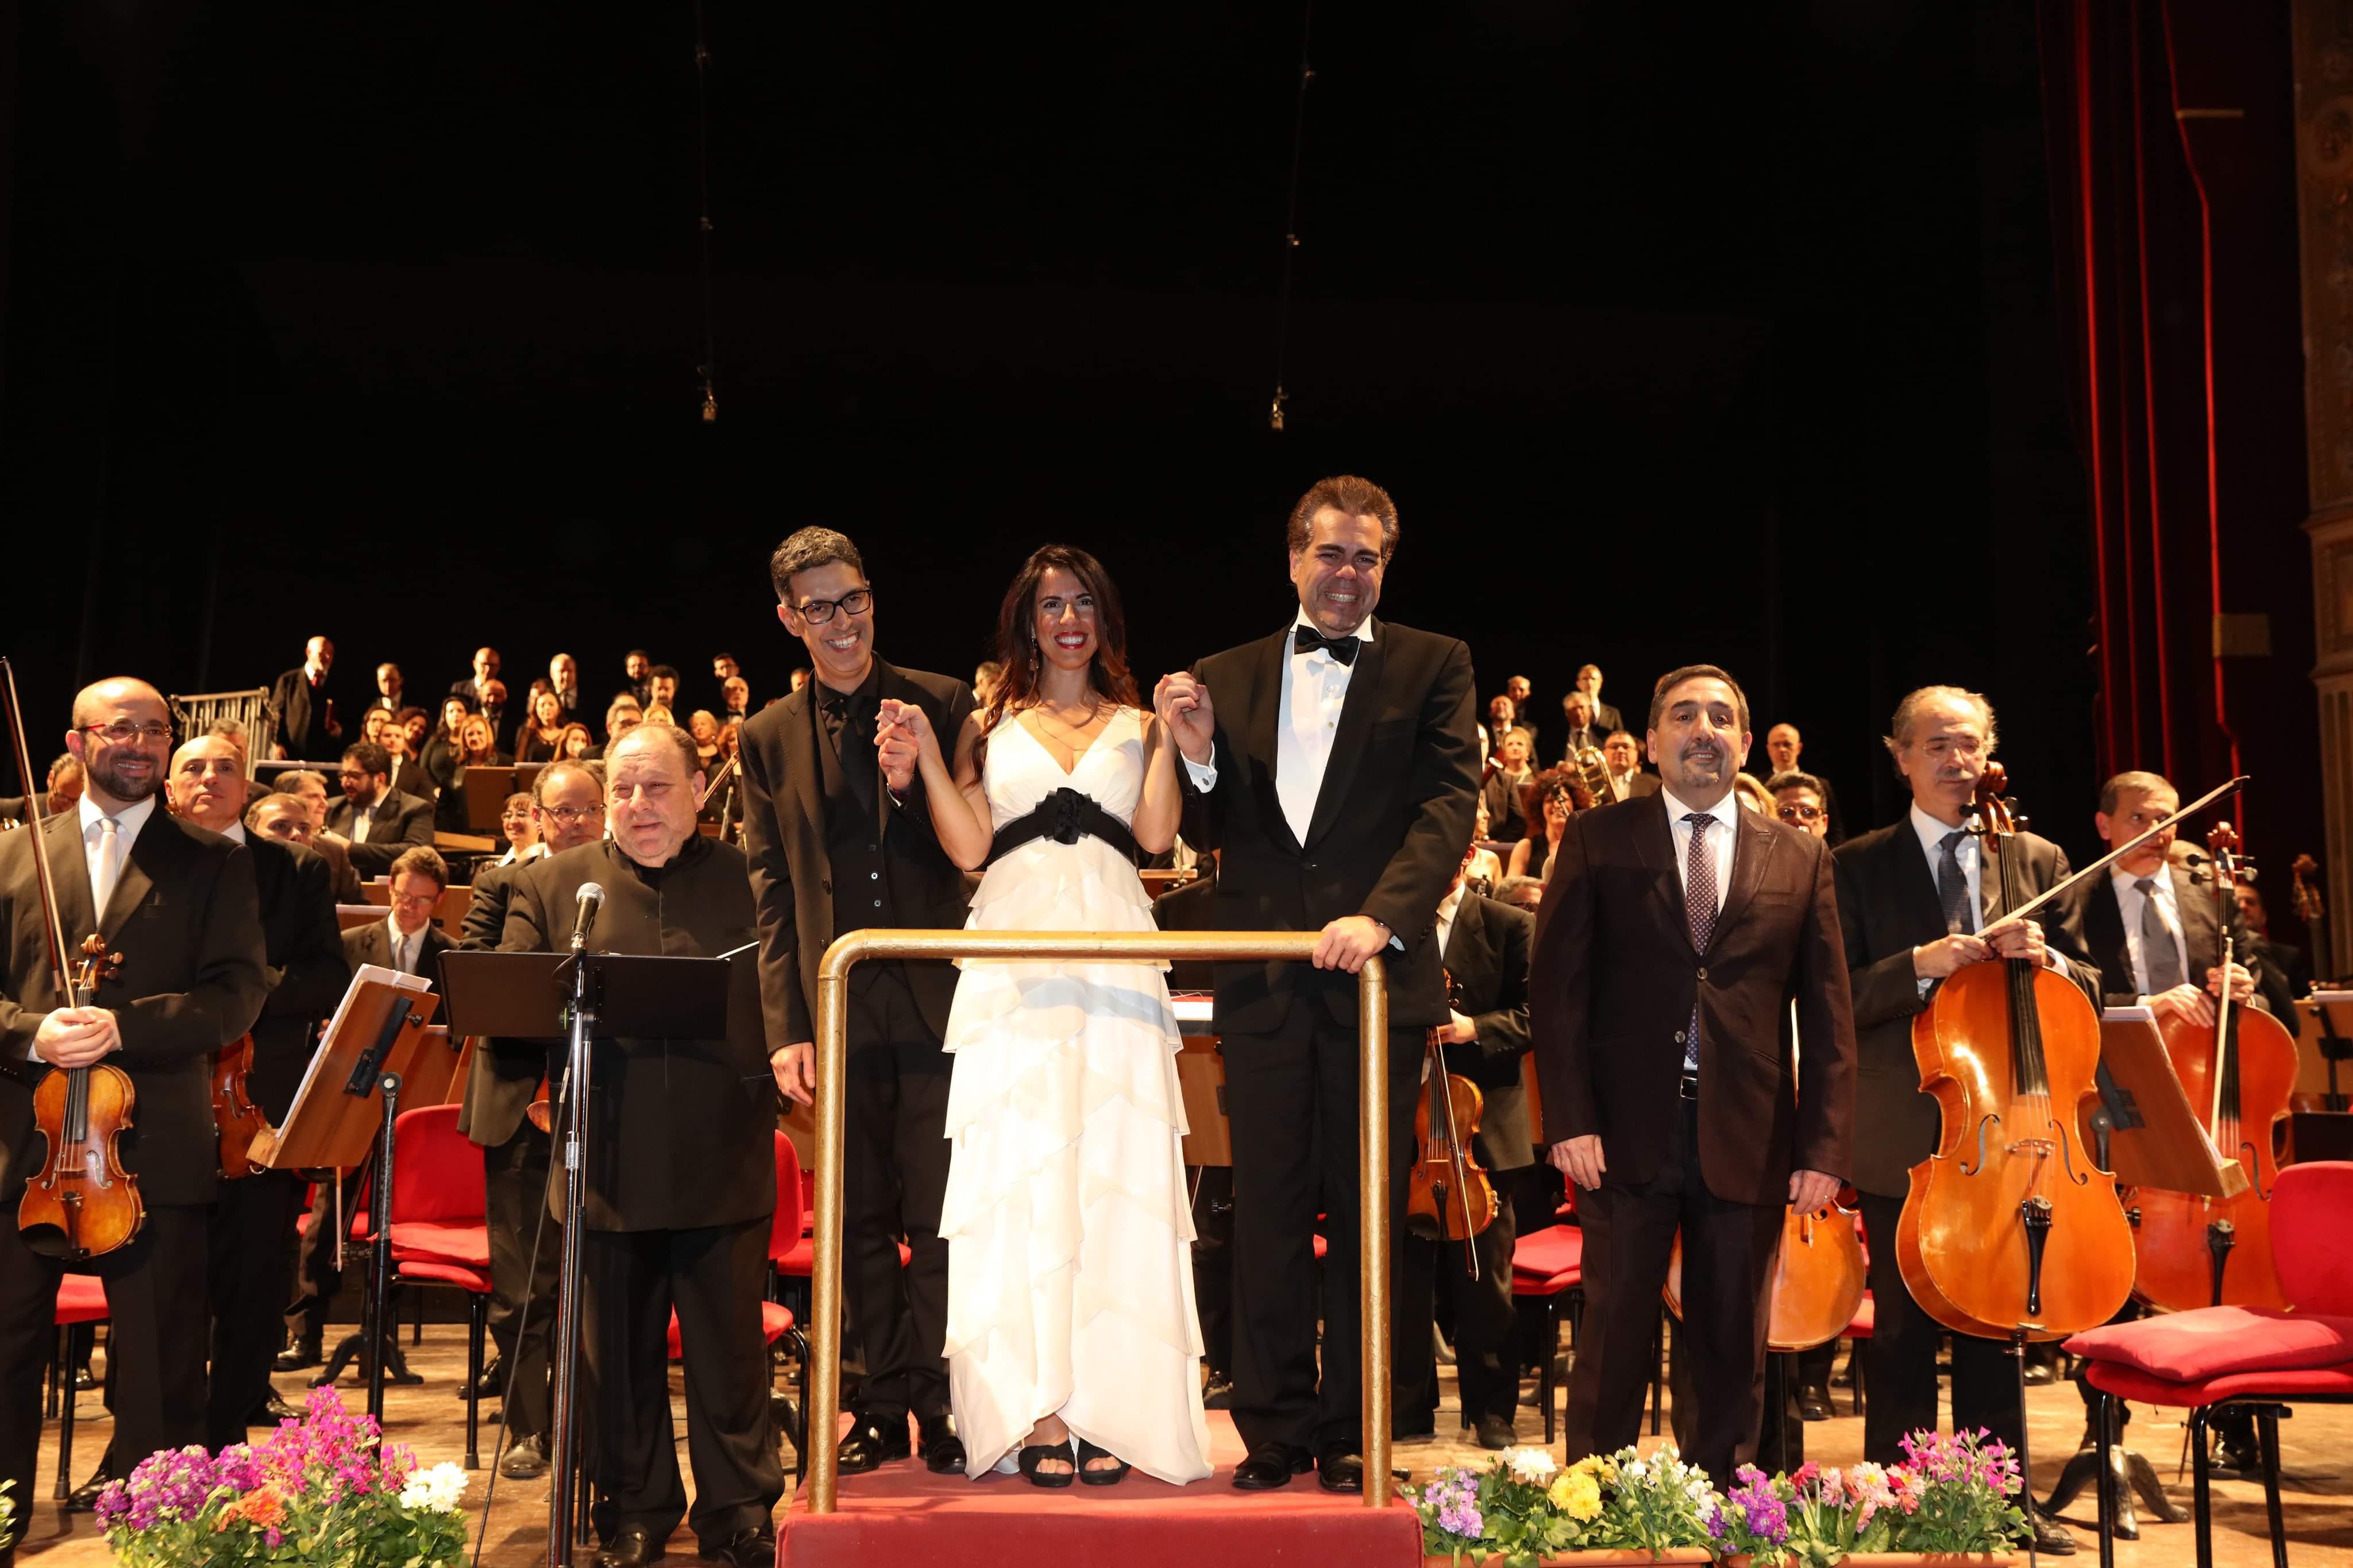 Diva Agatha - Teatro Massimo Bellini - 1 febbraio 2020